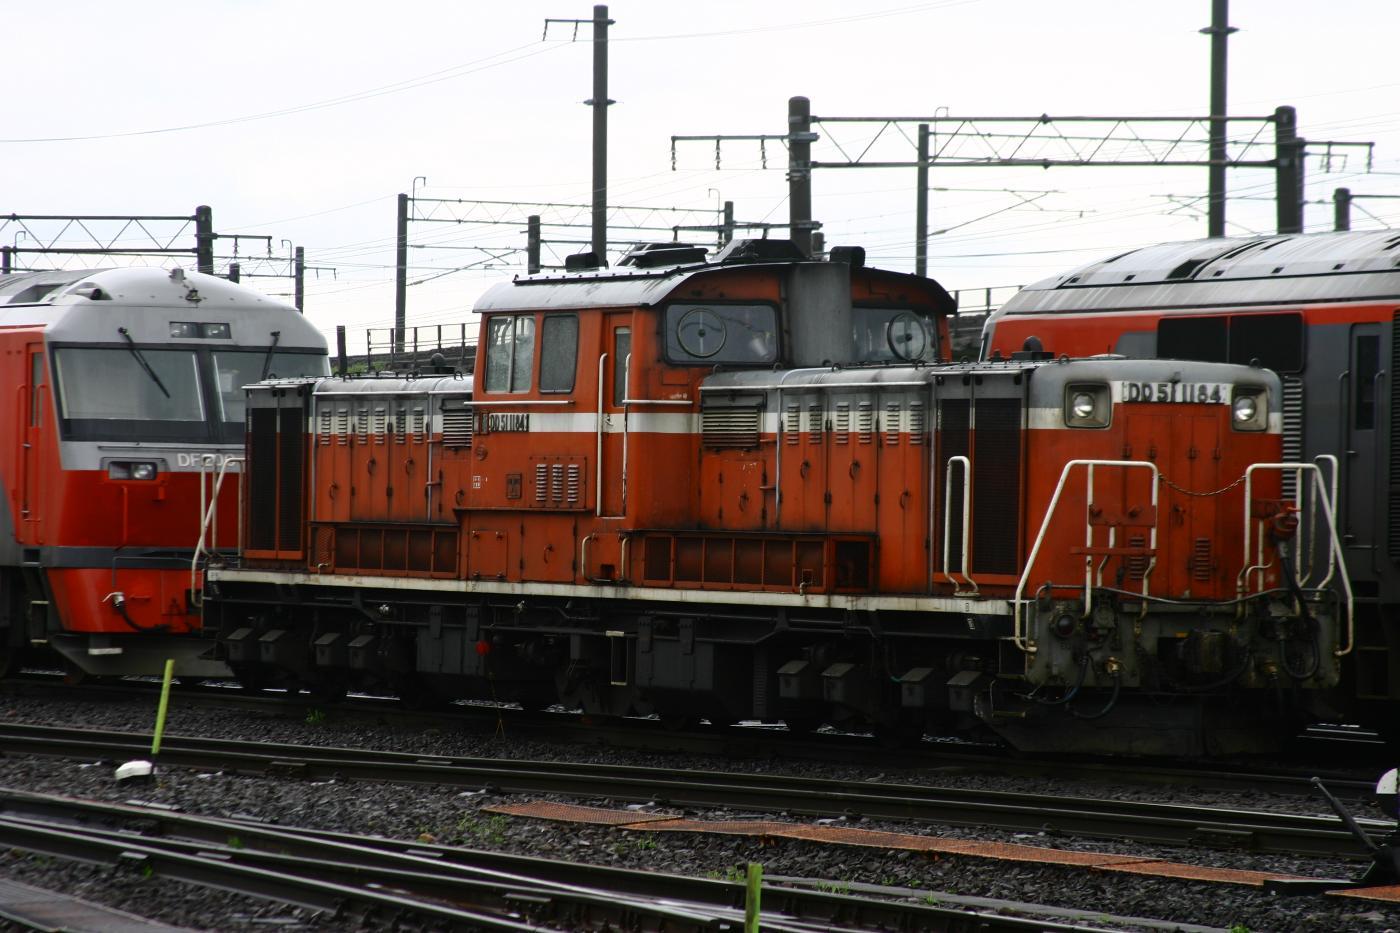 S120505001